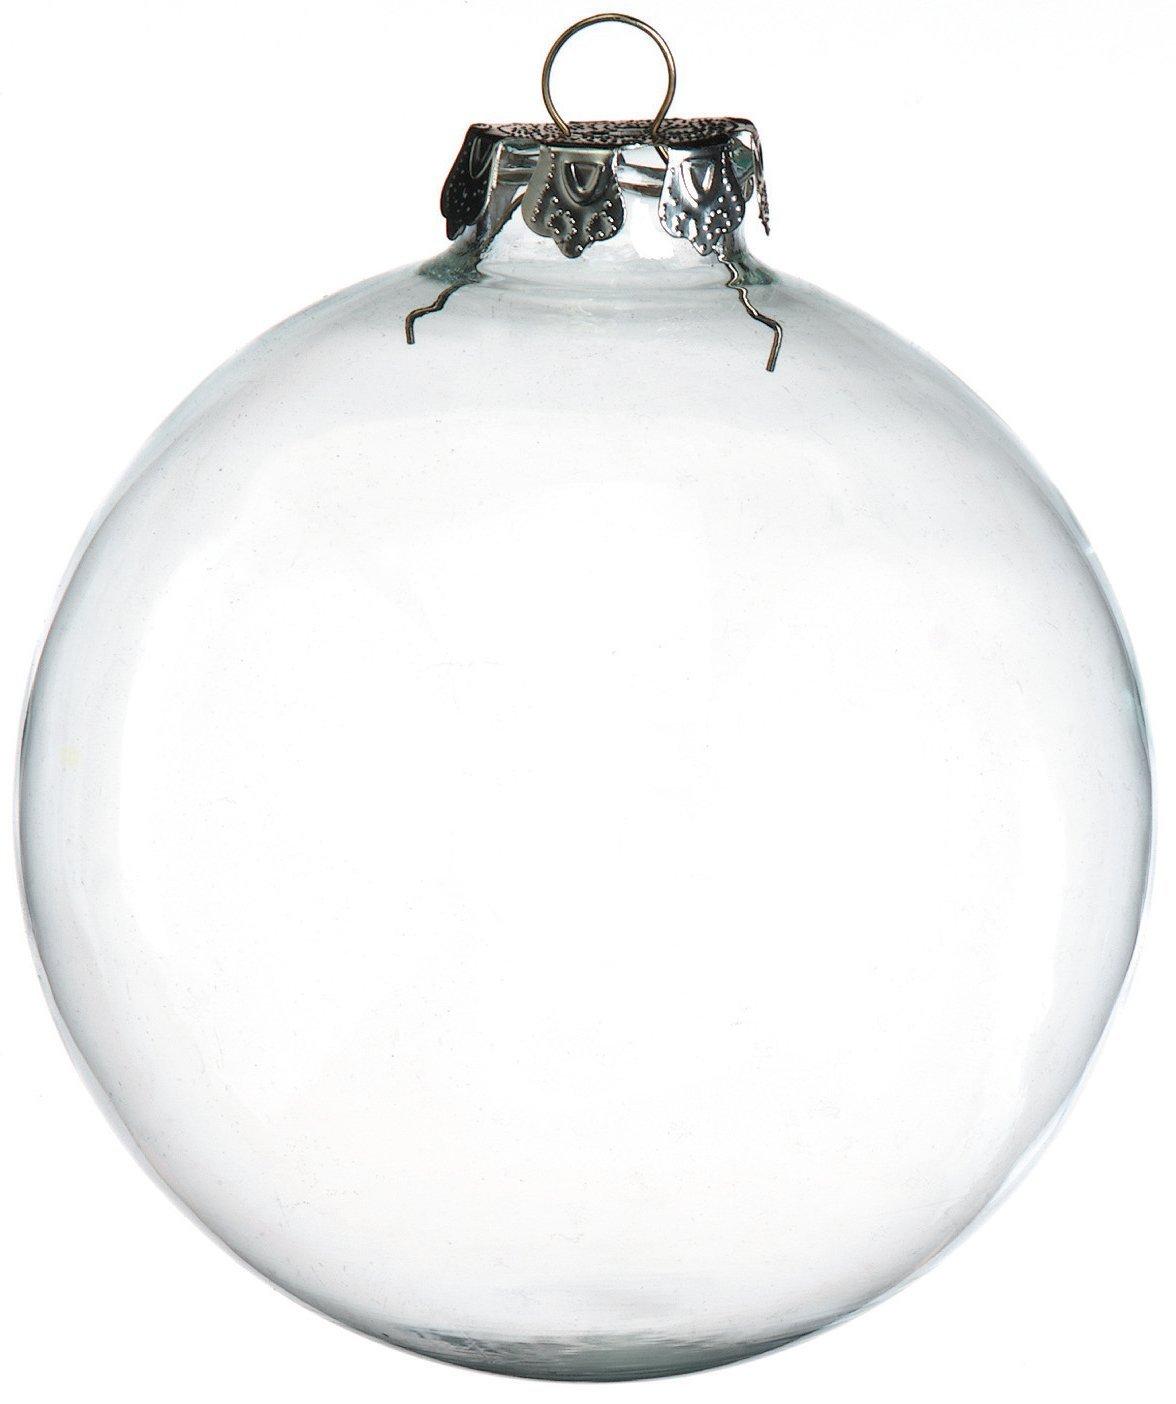 Amazoncom Darice 2Piece Glass Balls 100mm Clear Home  Kitchen